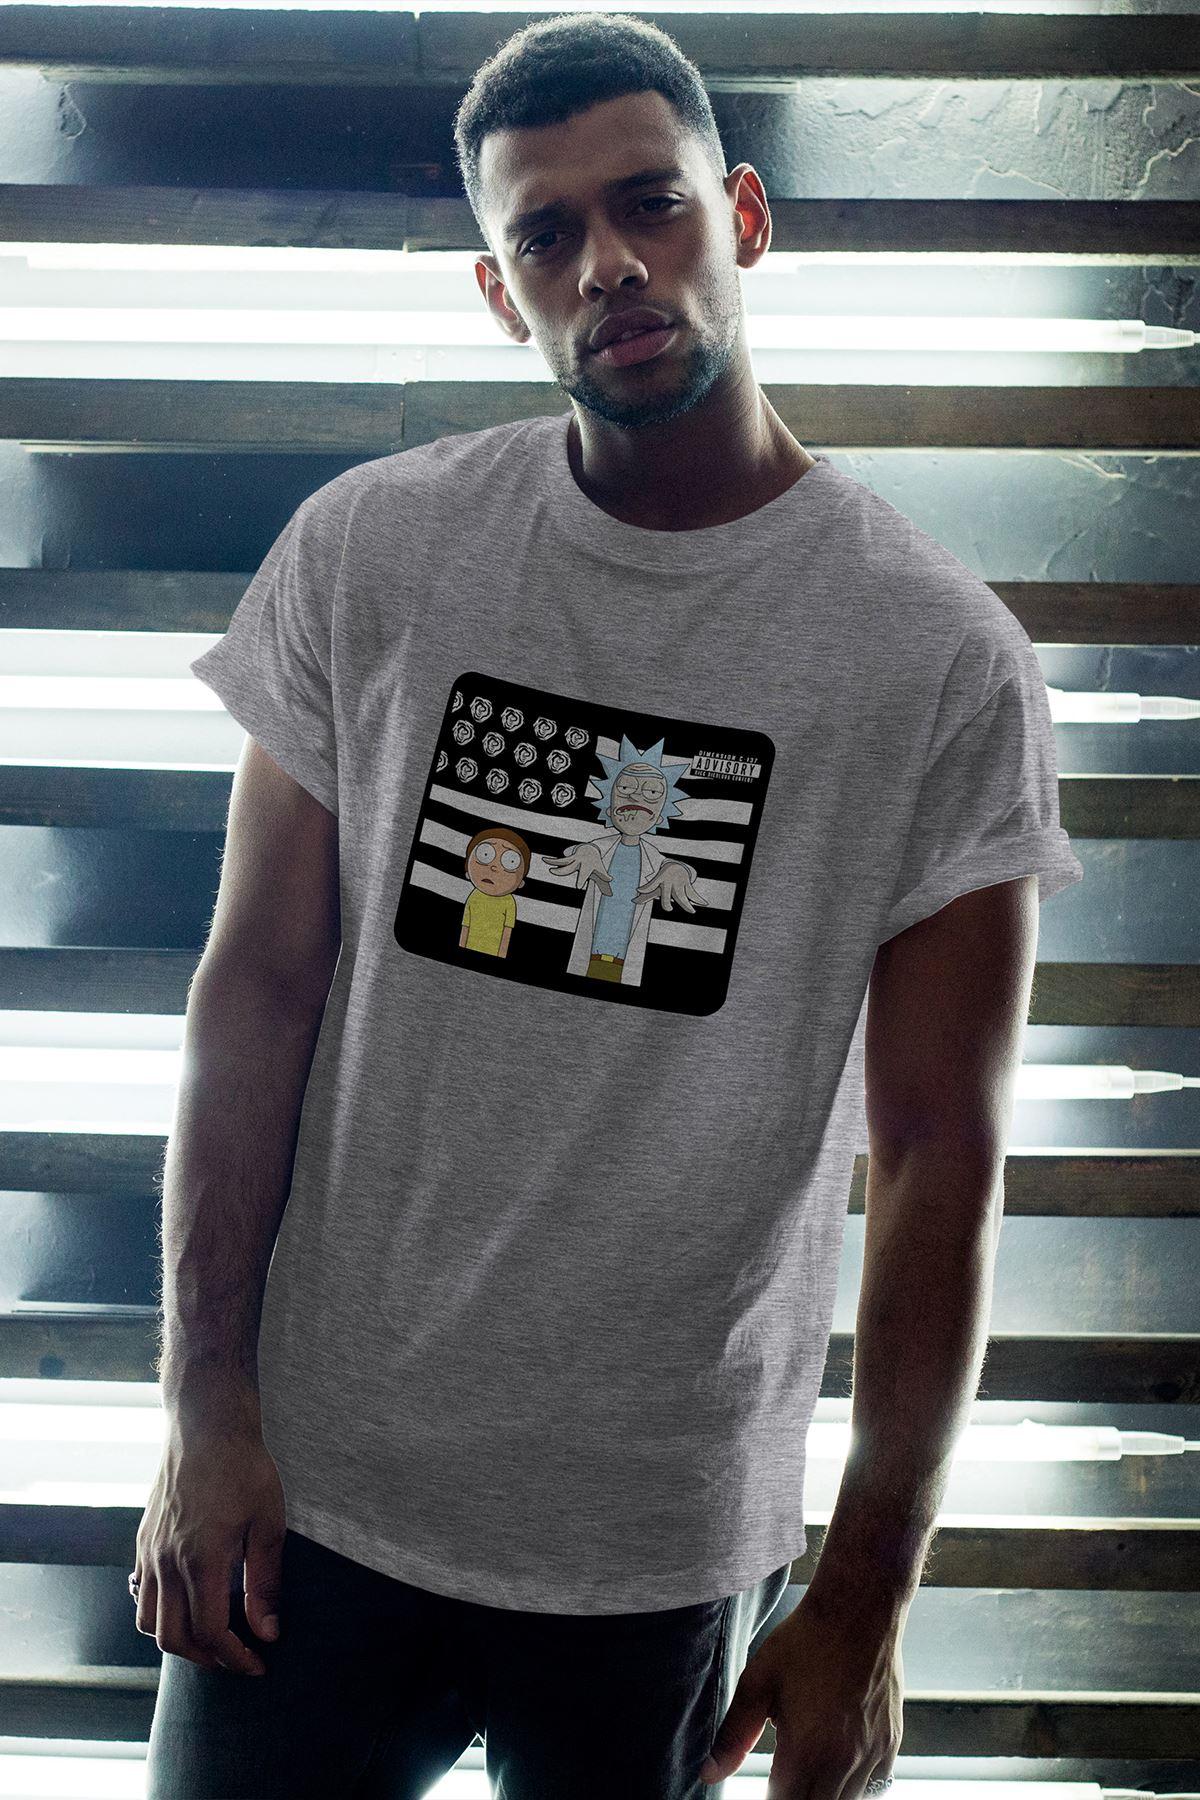 Rick and Morty 146 Gri Erkek Oversize Tshirt - Tişört